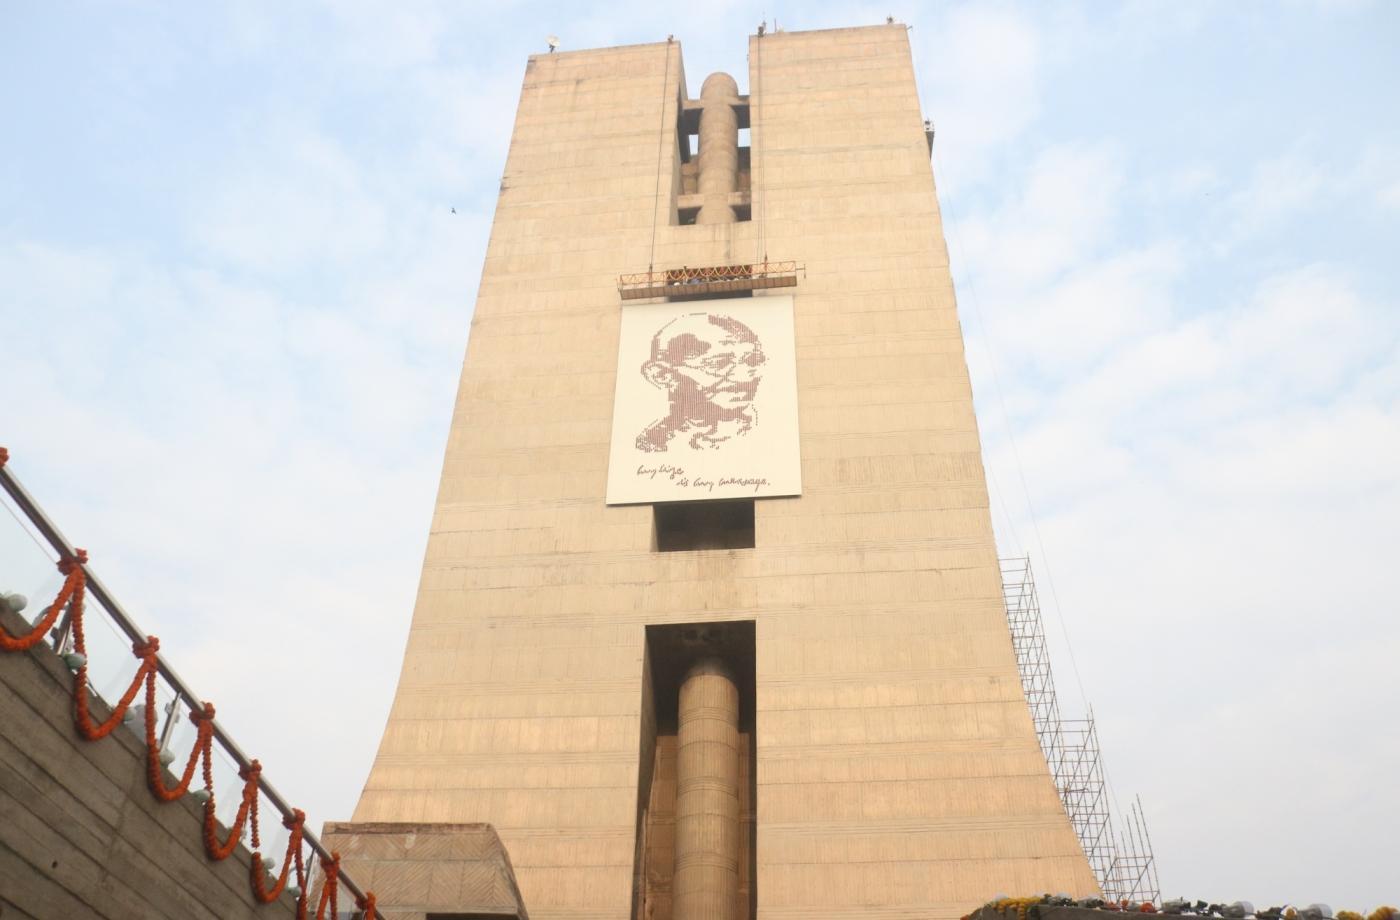 New Delhi: A view of Grand Wall Mural of Mahatma Gandhi at NDMC Headquarter Building in New Delhi on Jan 31, 2019. (Photo: IANS). by .